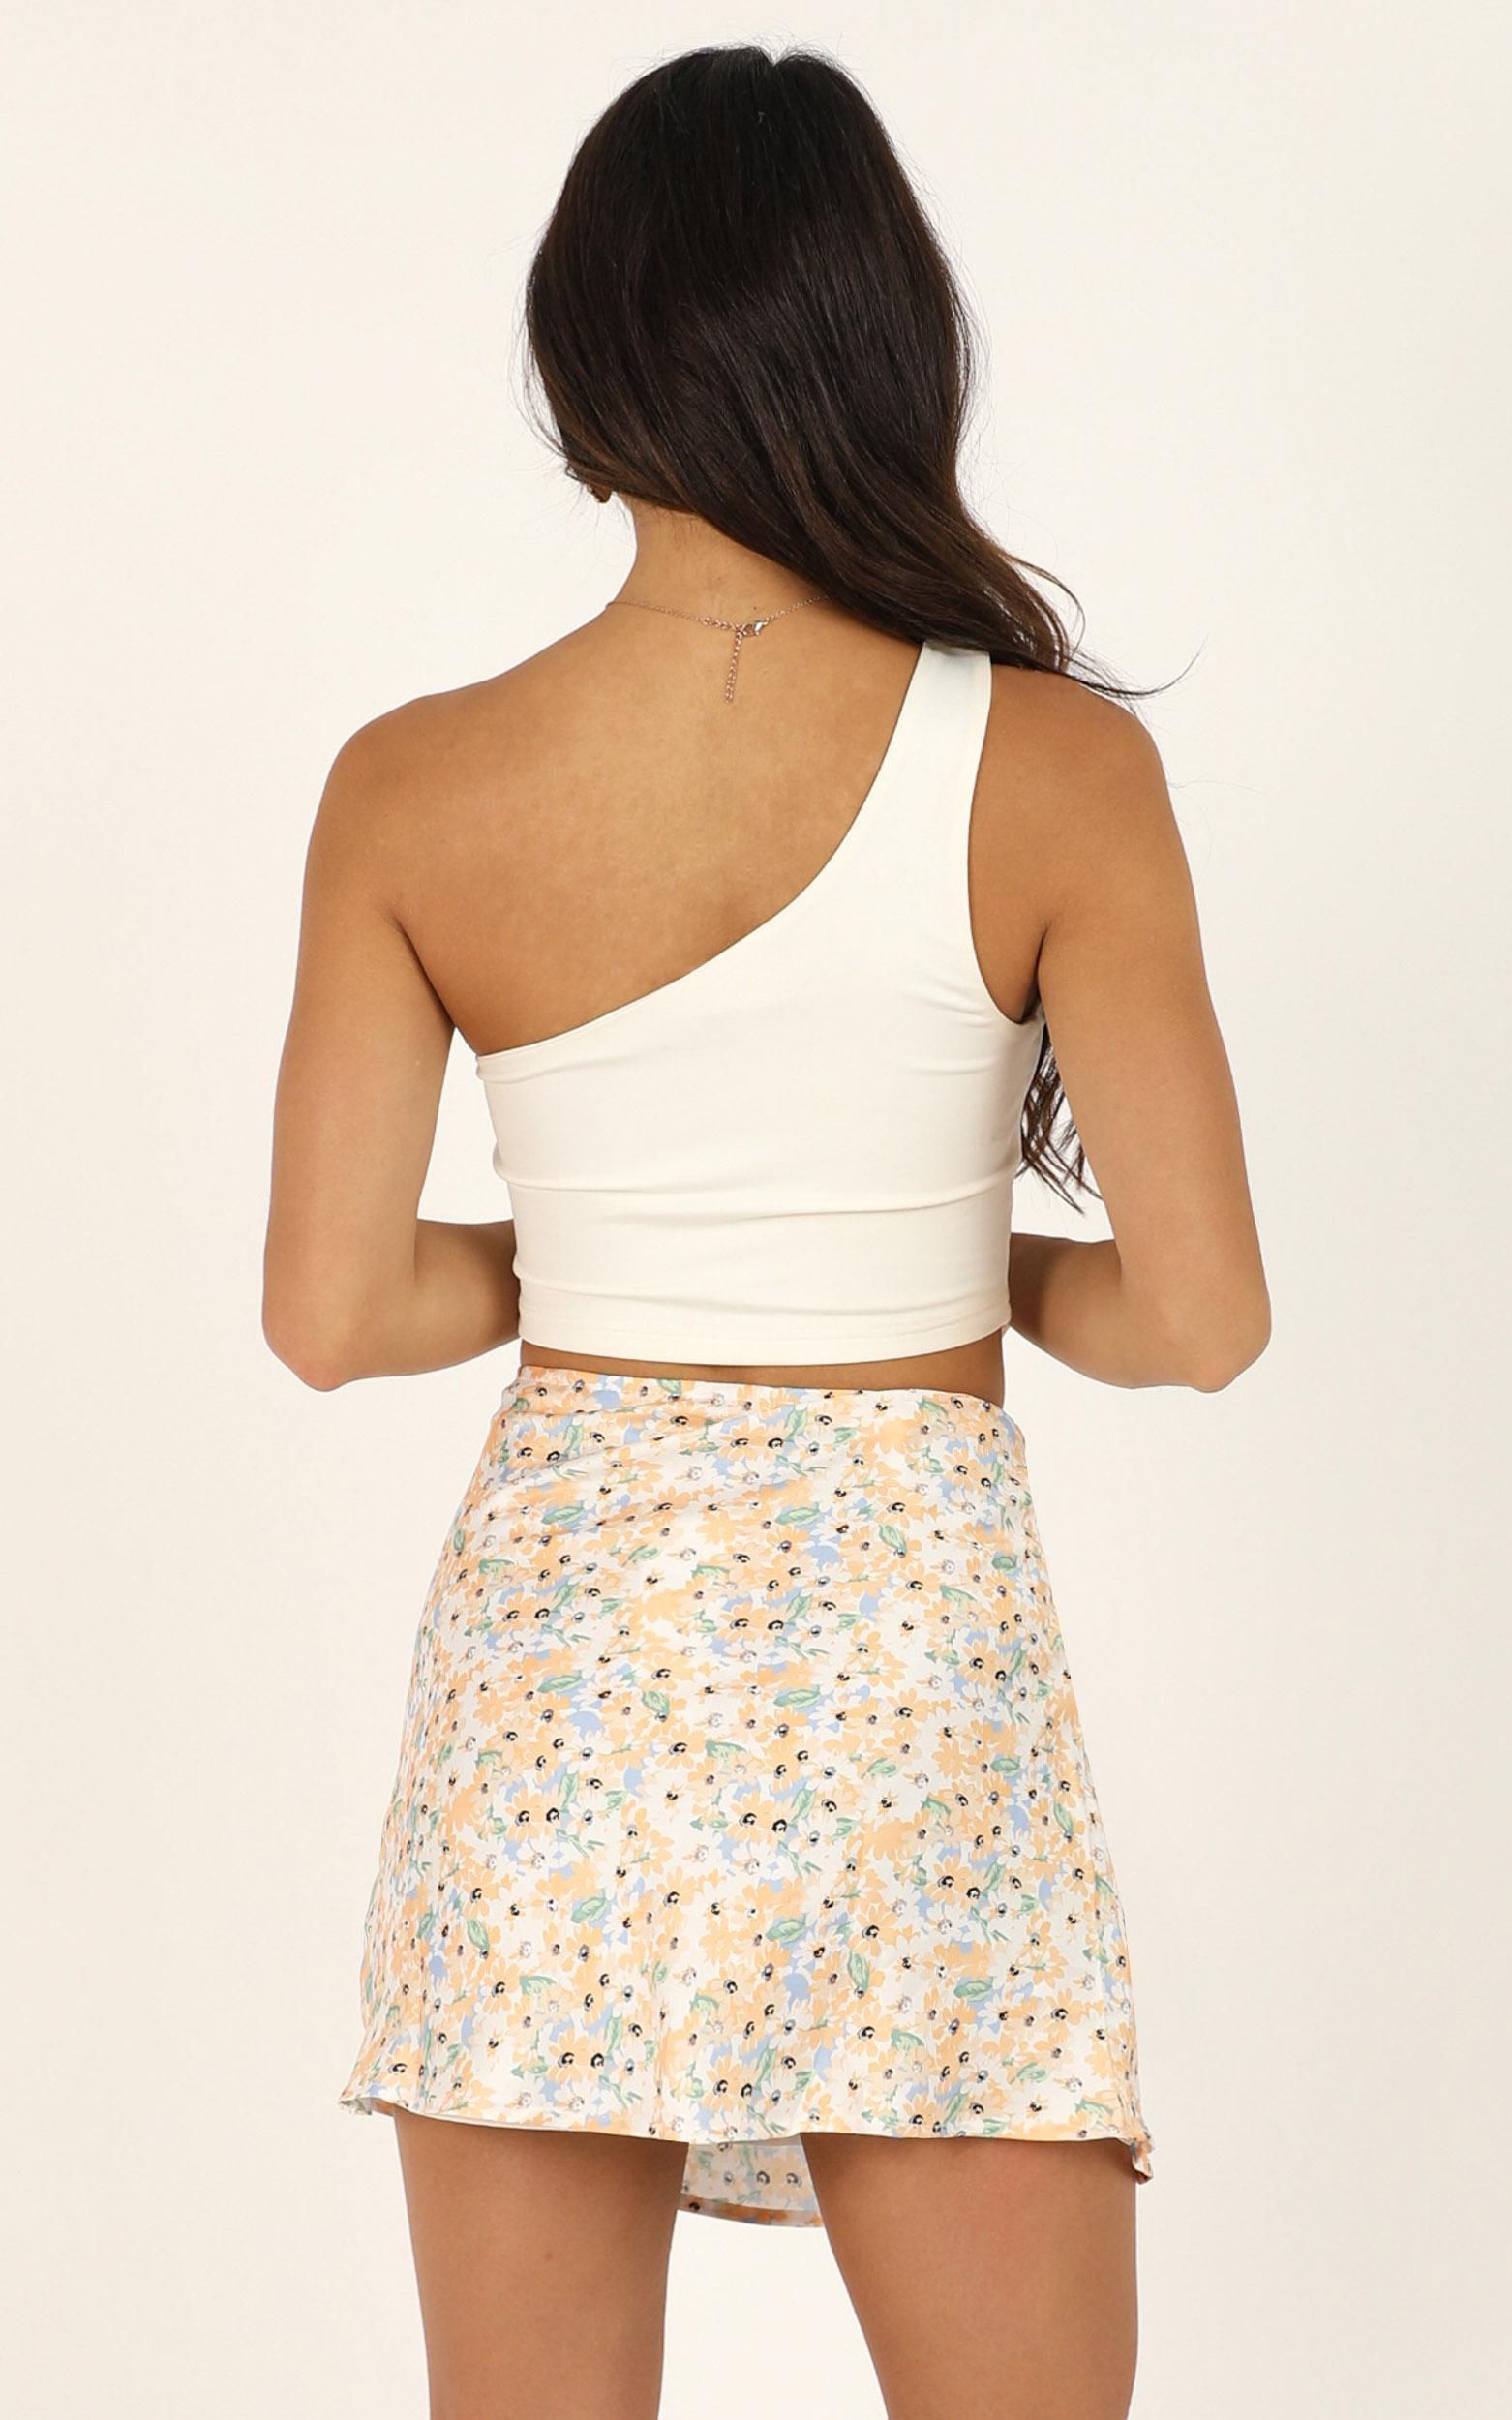 Parisian Life Skirt In Multi Floral - 14 (XL), Cream, hi-res image number null